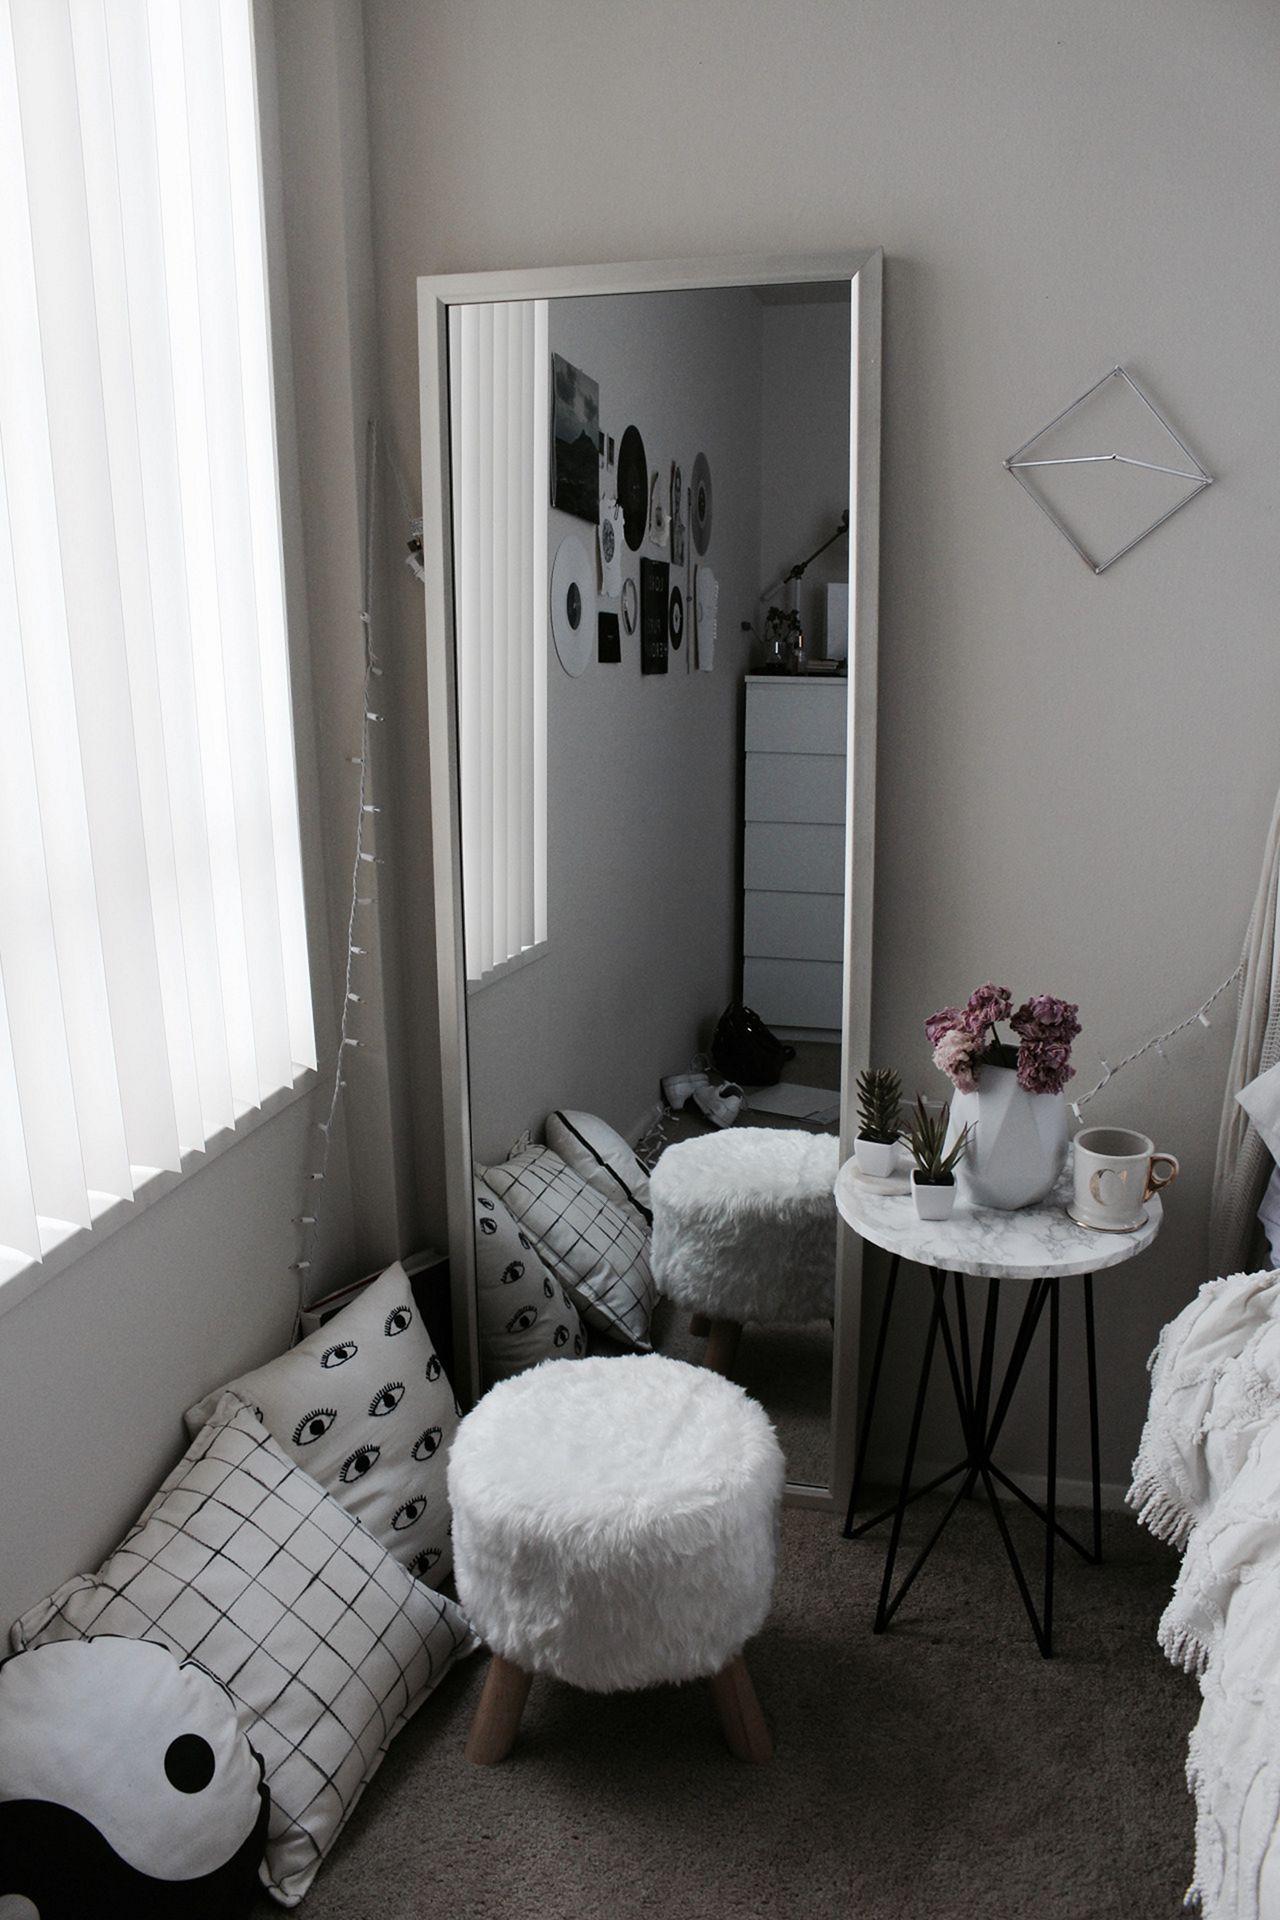 Small Aesthetic Bedroom Ideas (Small Aesthetic Bedroom ... on Room Decor Aesthetic id=29423